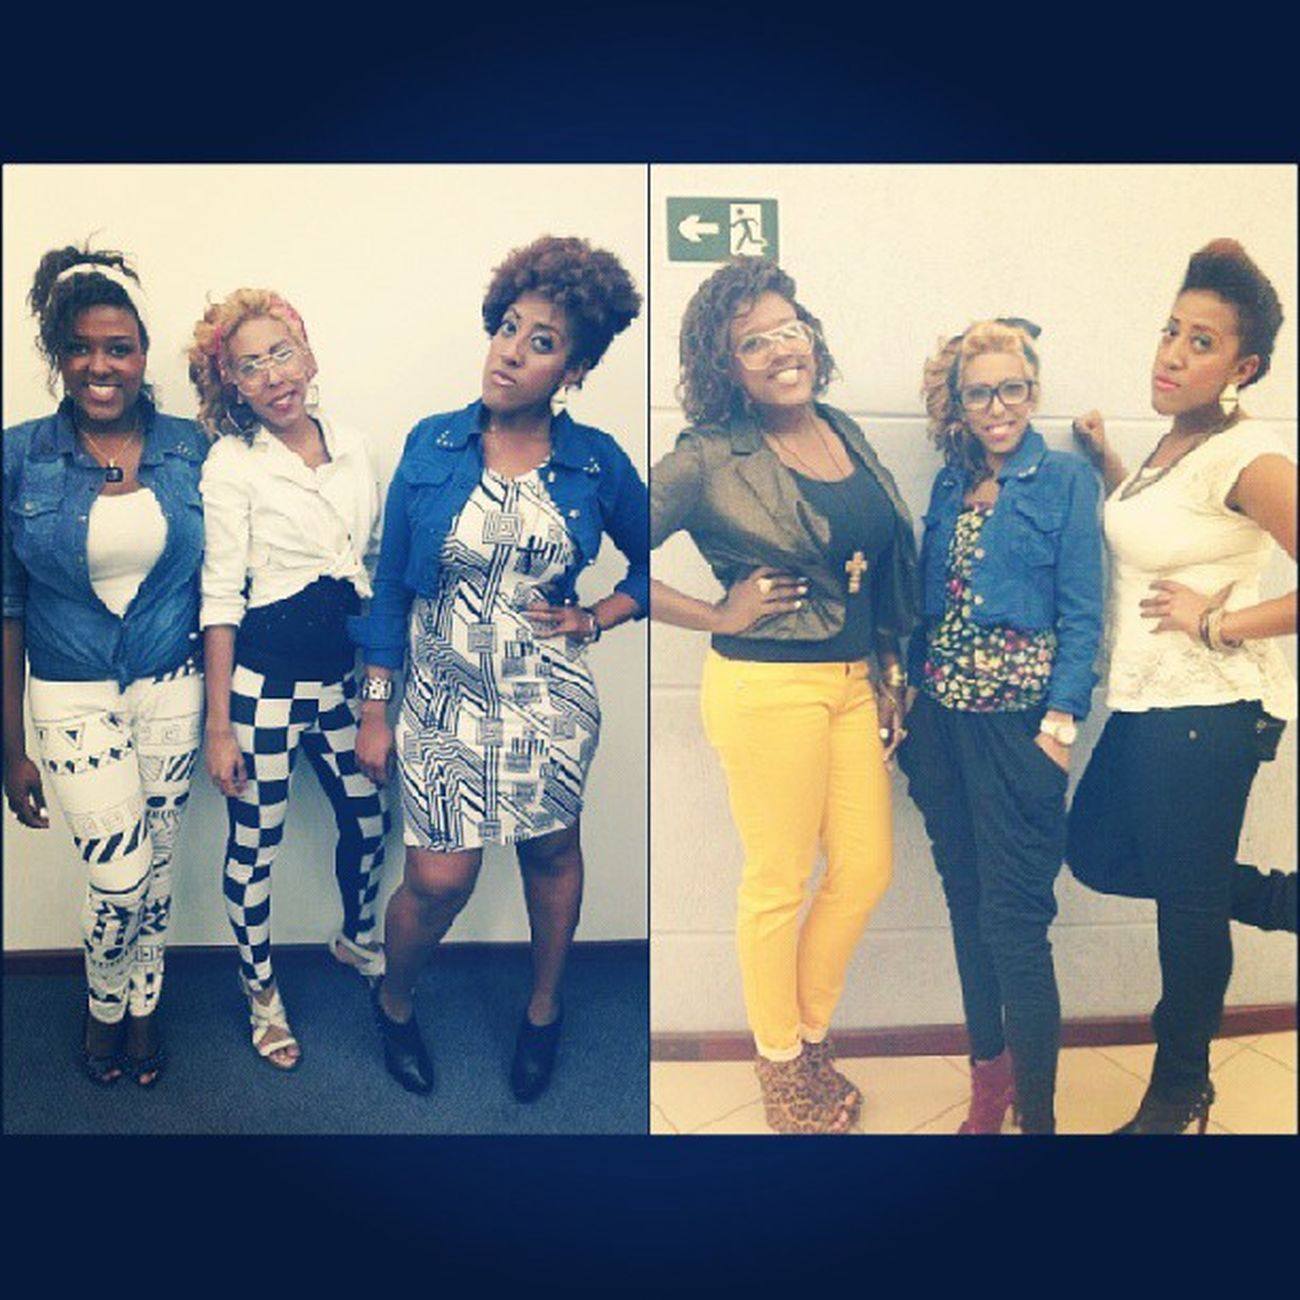 Swaggirls Stylegirls Beautiful Lindas niggaz blackgirls Noiiix causando nos looks do musical :D